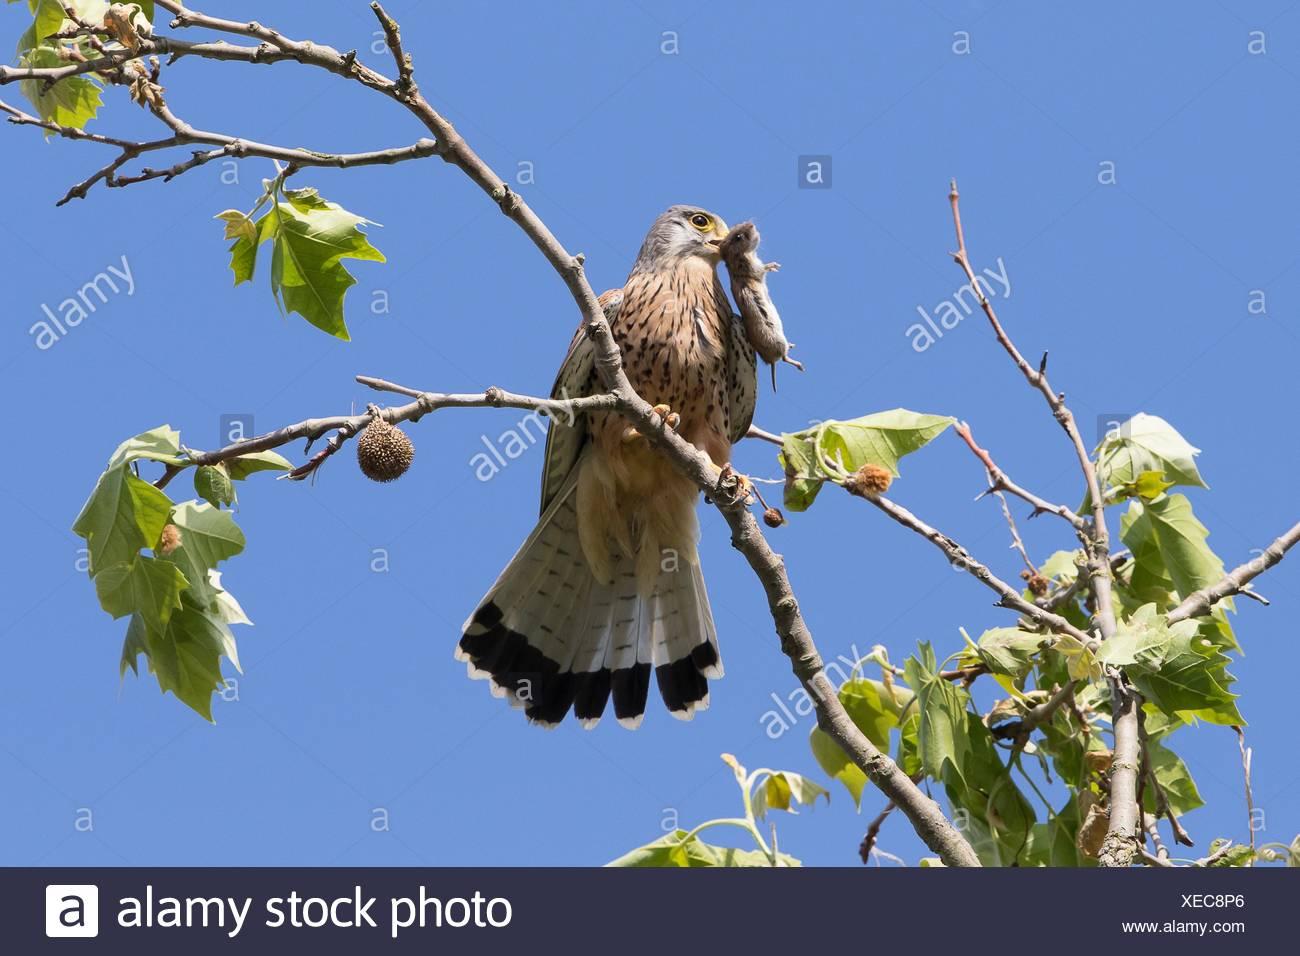 Common Kestrel (Falco tinnunculus) with captured Vole (Microtus arvalis), Hesse, Germany - Stock Image